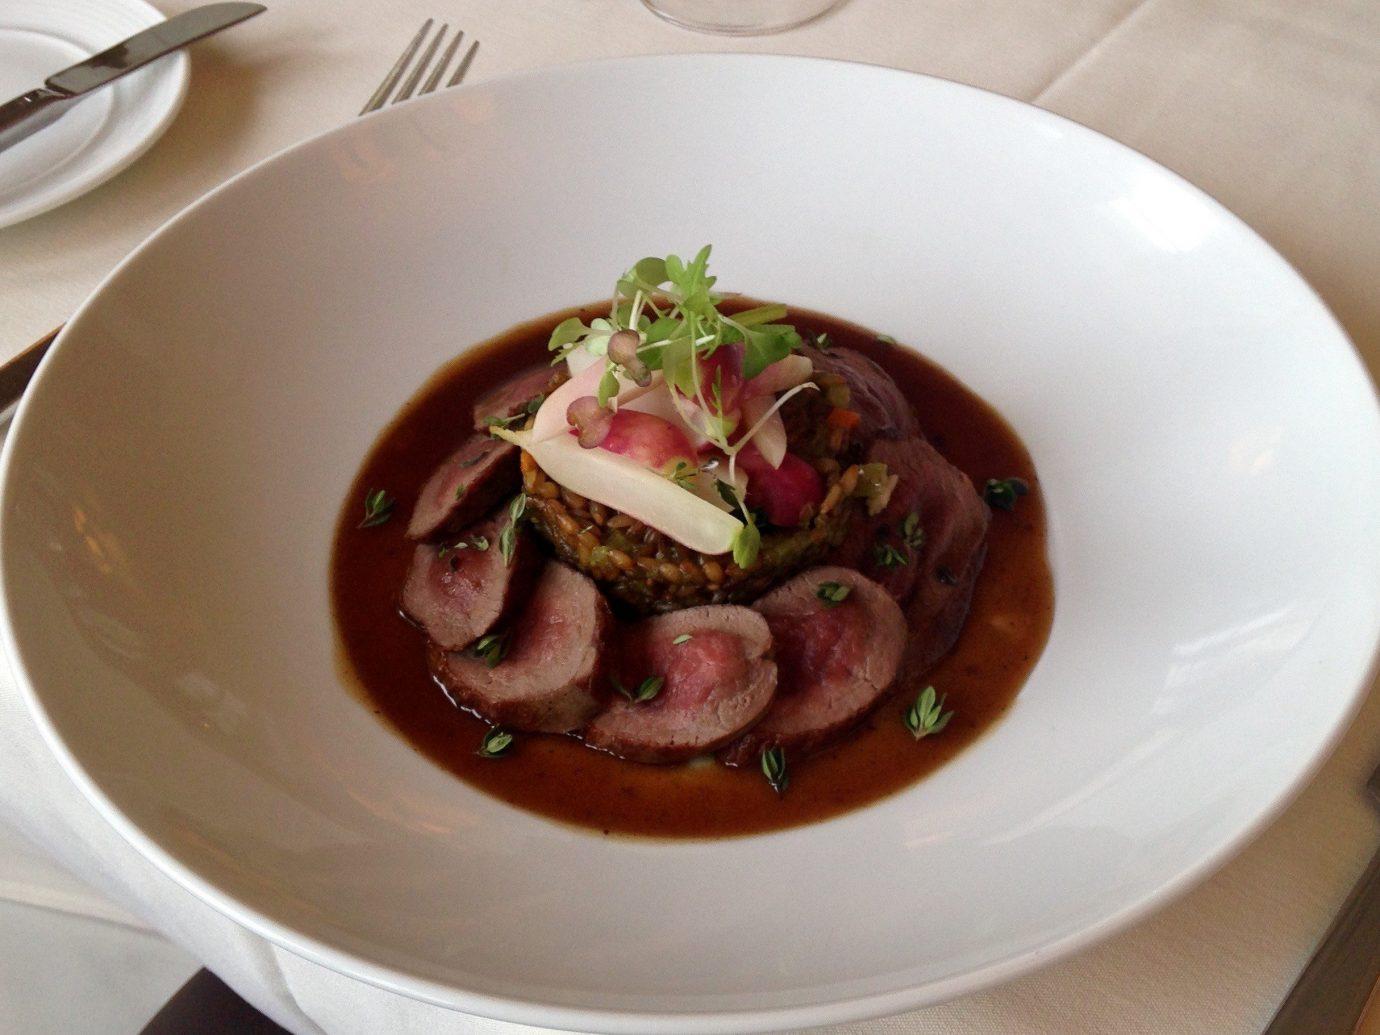 Food + Drink plate table food dish indoor meat meal cuisine produce restaurant vegetable soup piece de resistance